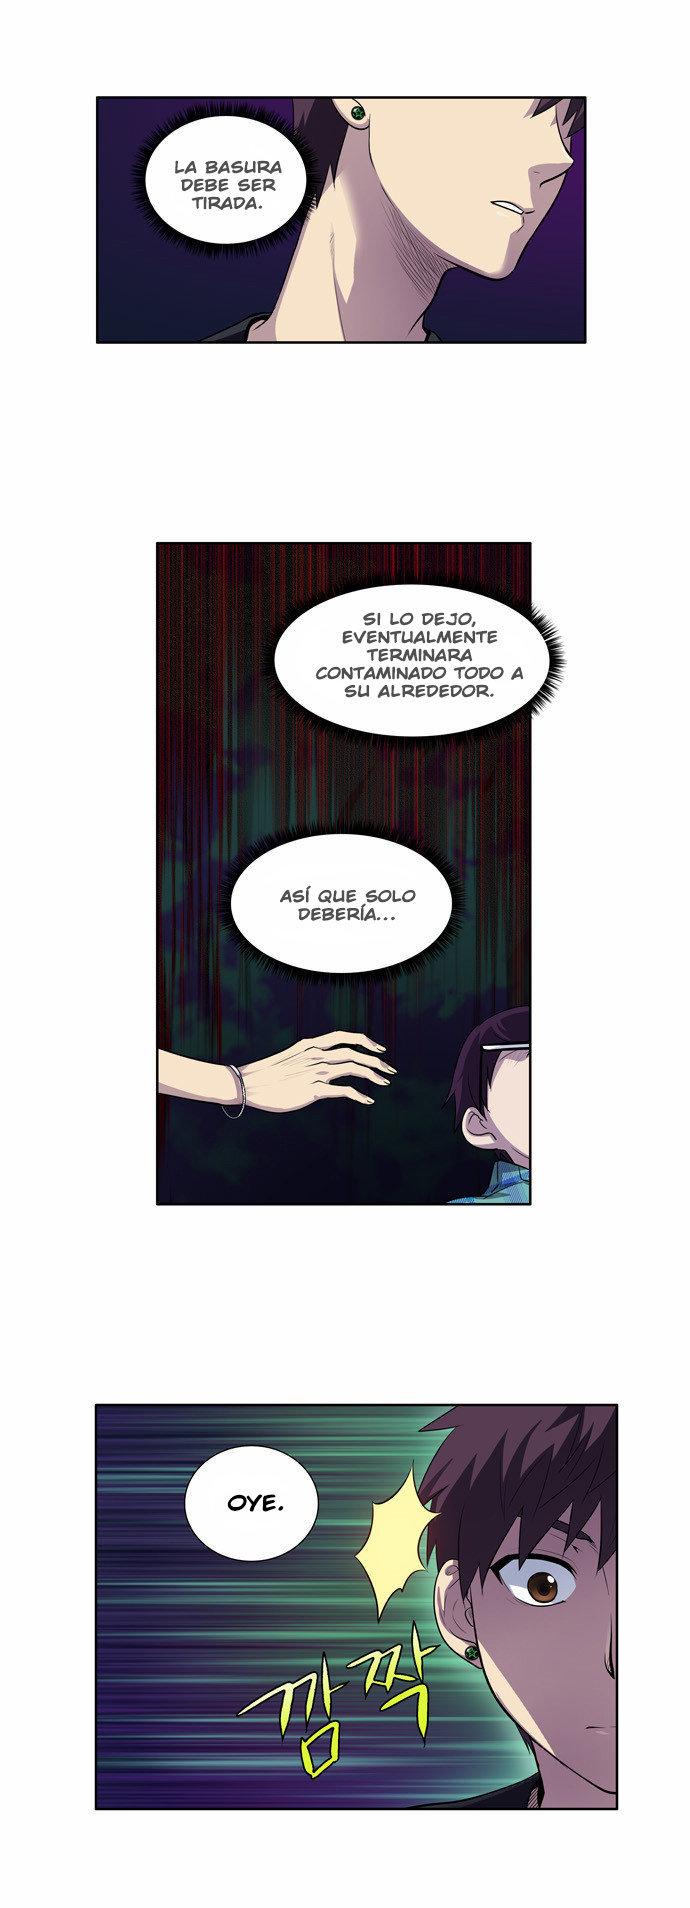 http://c5.ninemanga.com/es_manga/61/1725/442818/b25b911ffc2b76a647454e5a53edf8b5.jpg Page 17